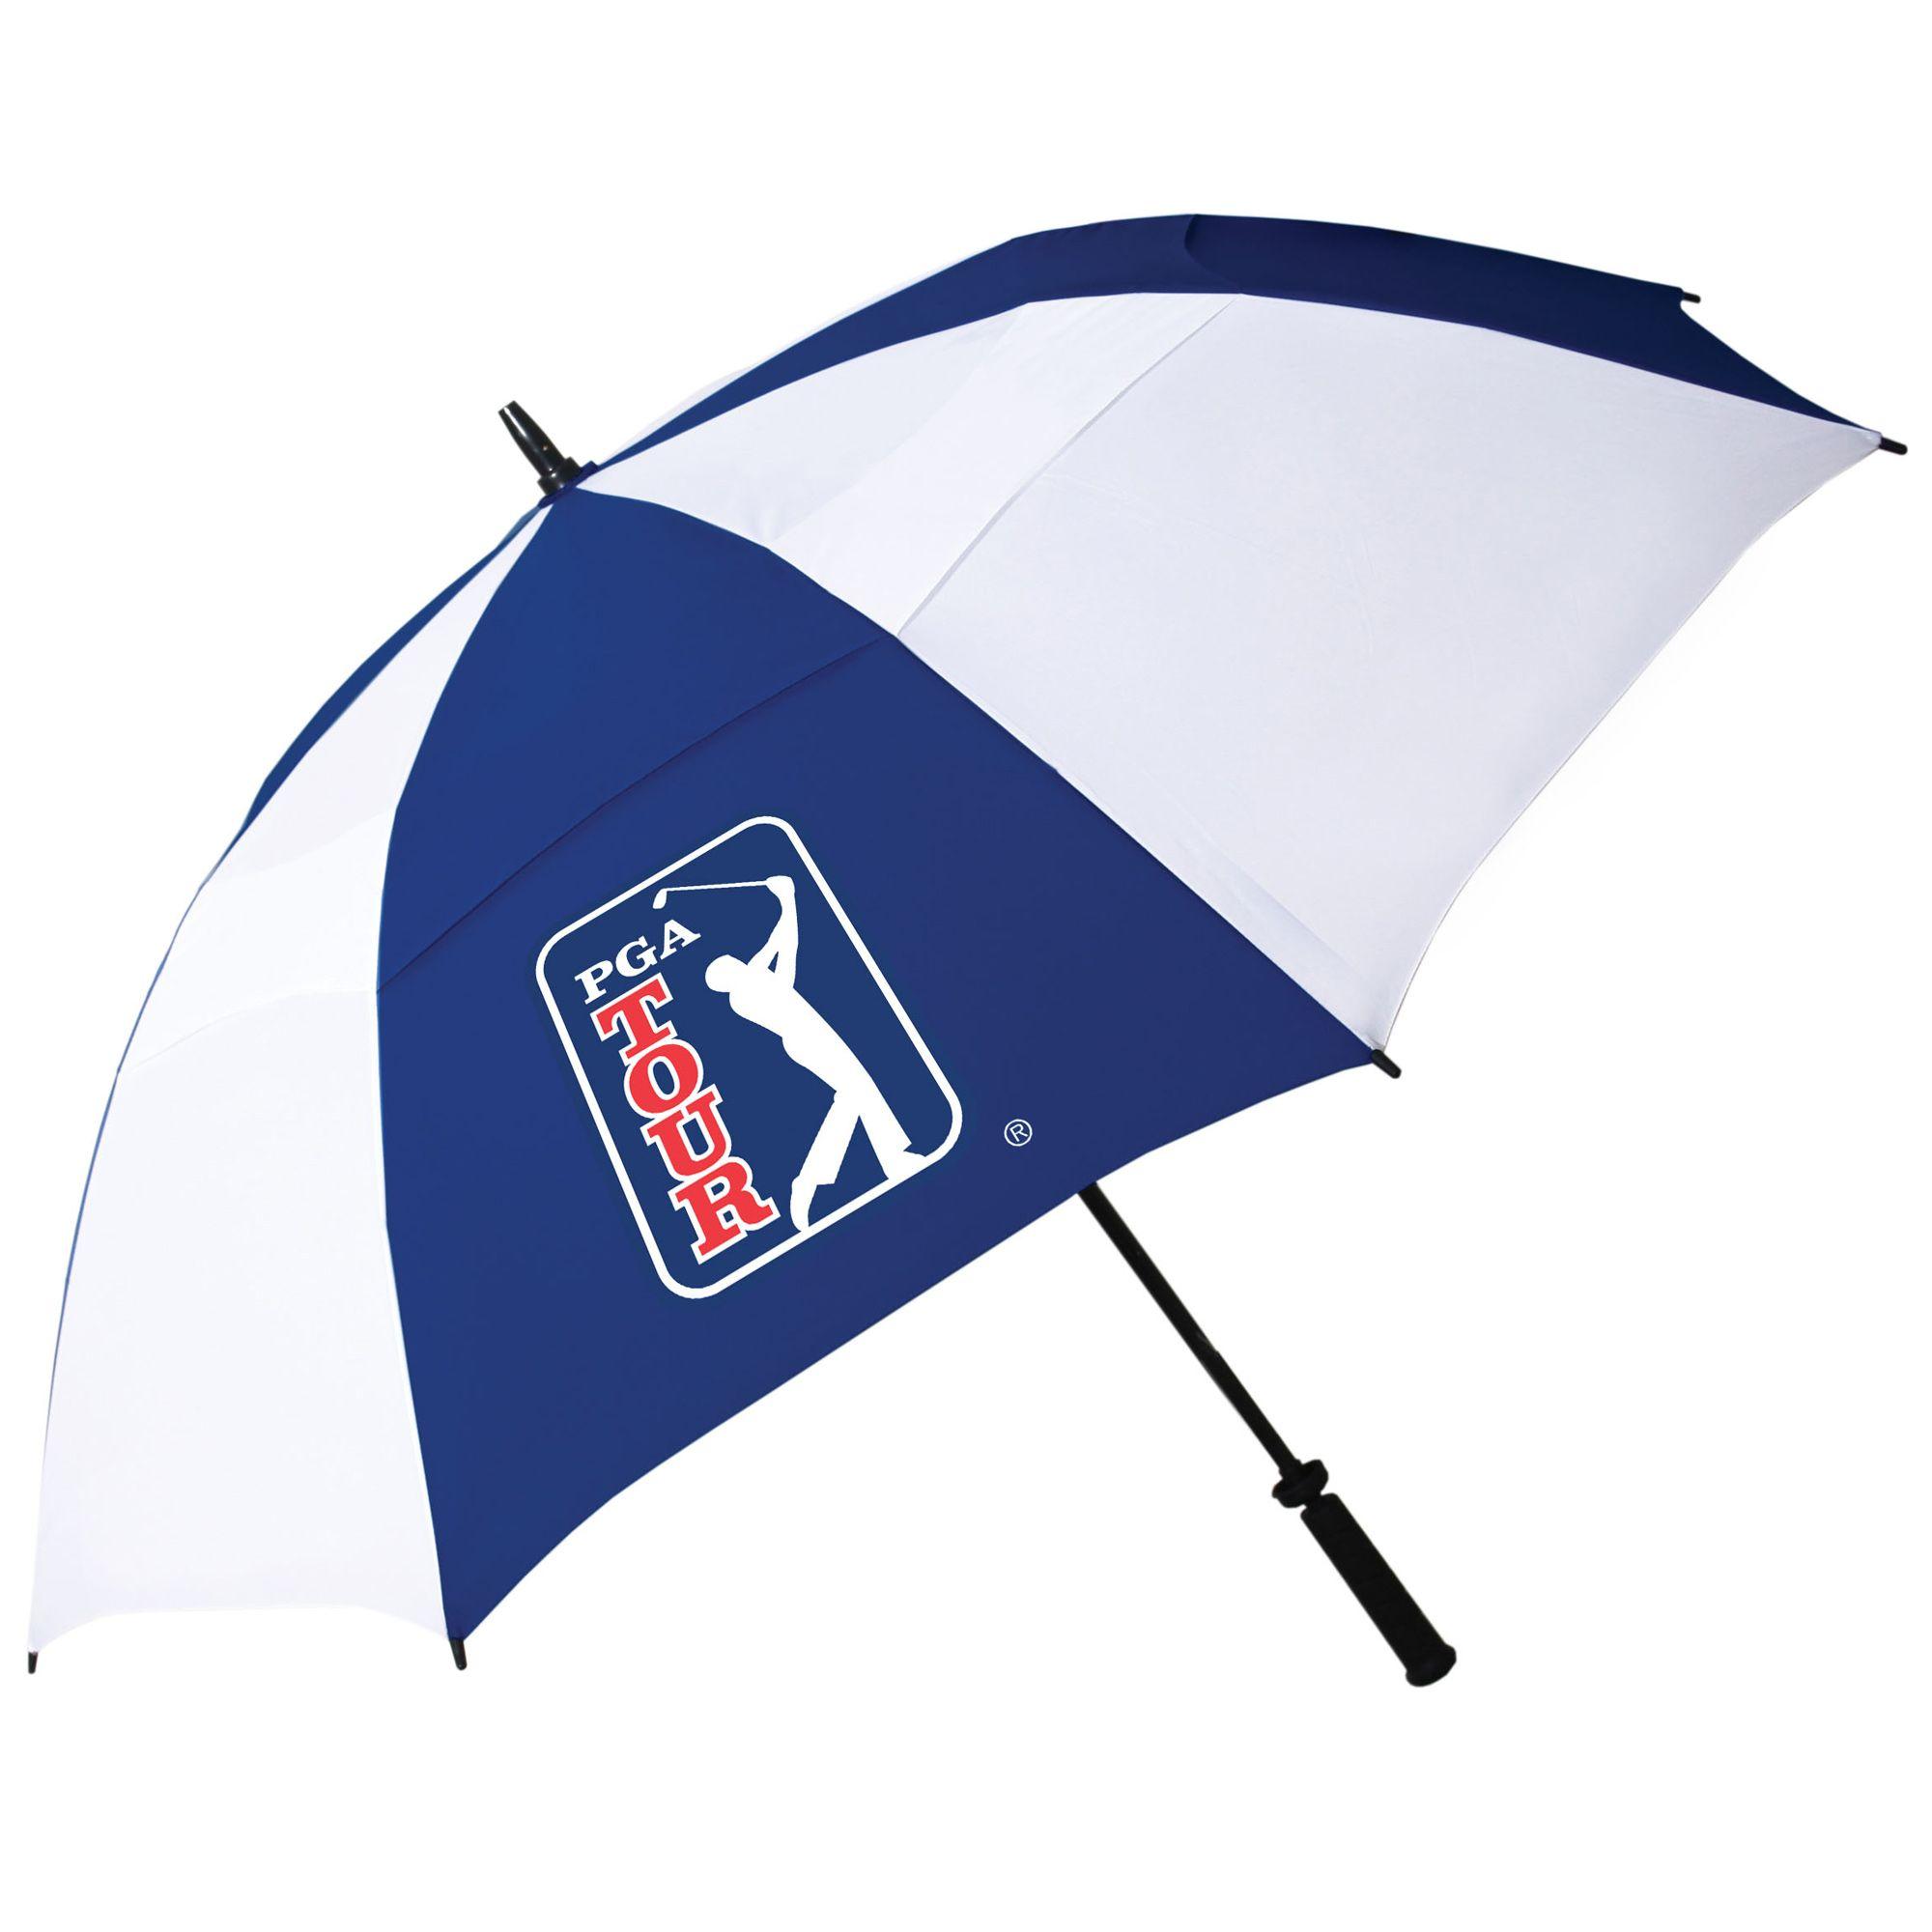 Pga tour windproof double canopy umbrella for Canopy umbrella